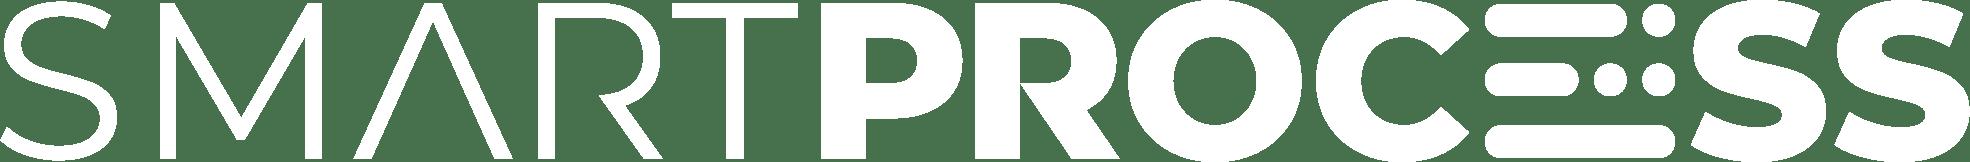 Logotipo_Smart Process_op02_Branco@2x